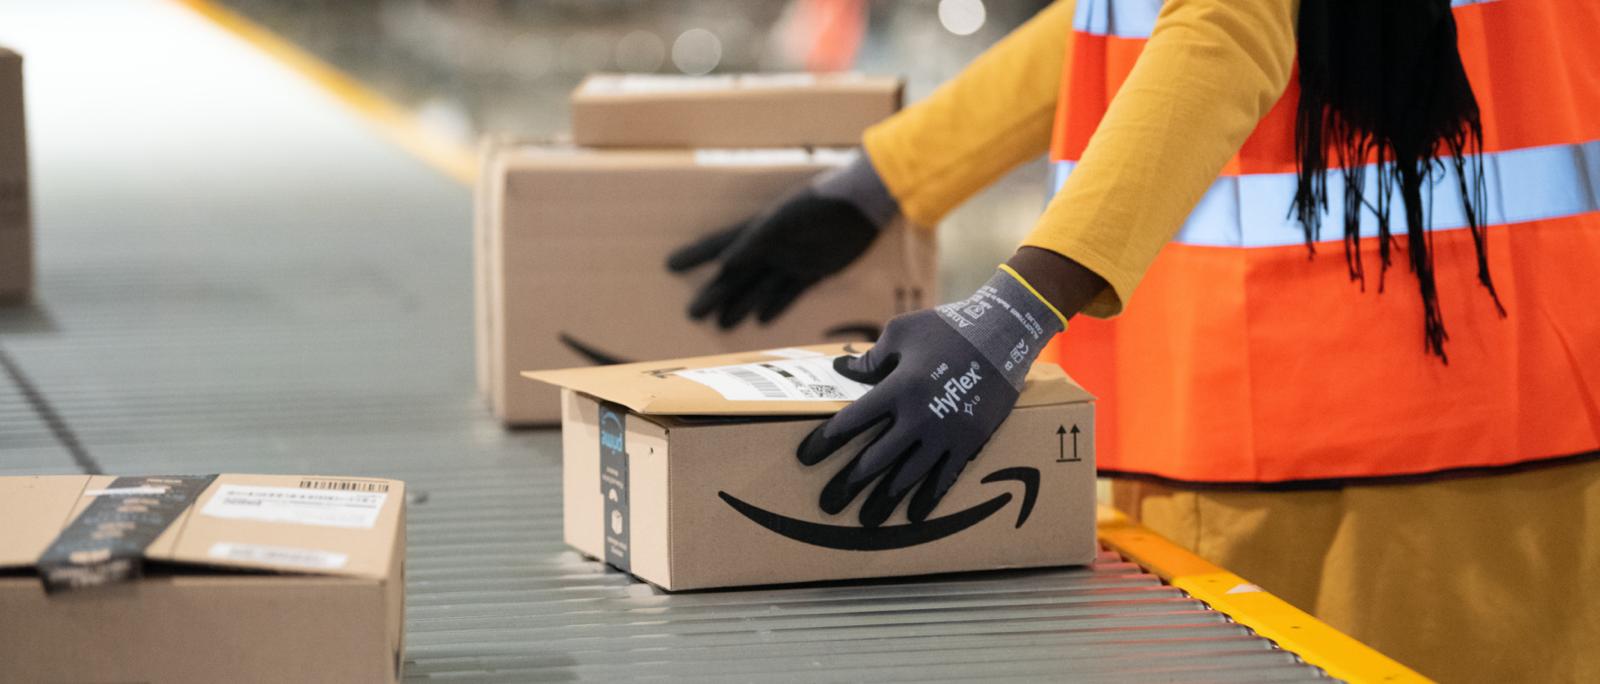 Amazon Fulfillment & Warehousing Locations